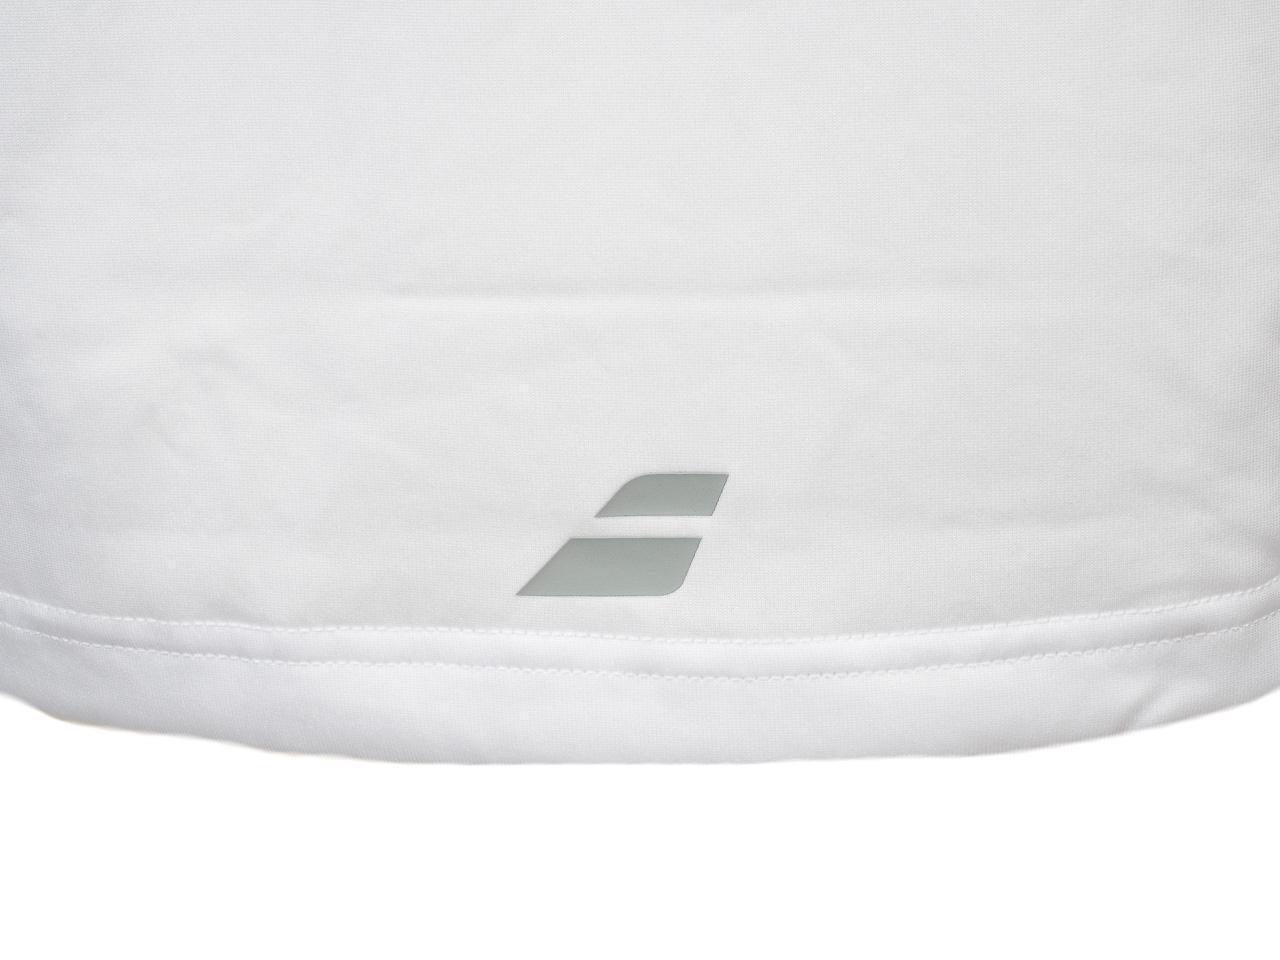 Tee-shirt-de-tennis-Babolat-Tee-core-flag-blanc-Blanc-70114-Neuf